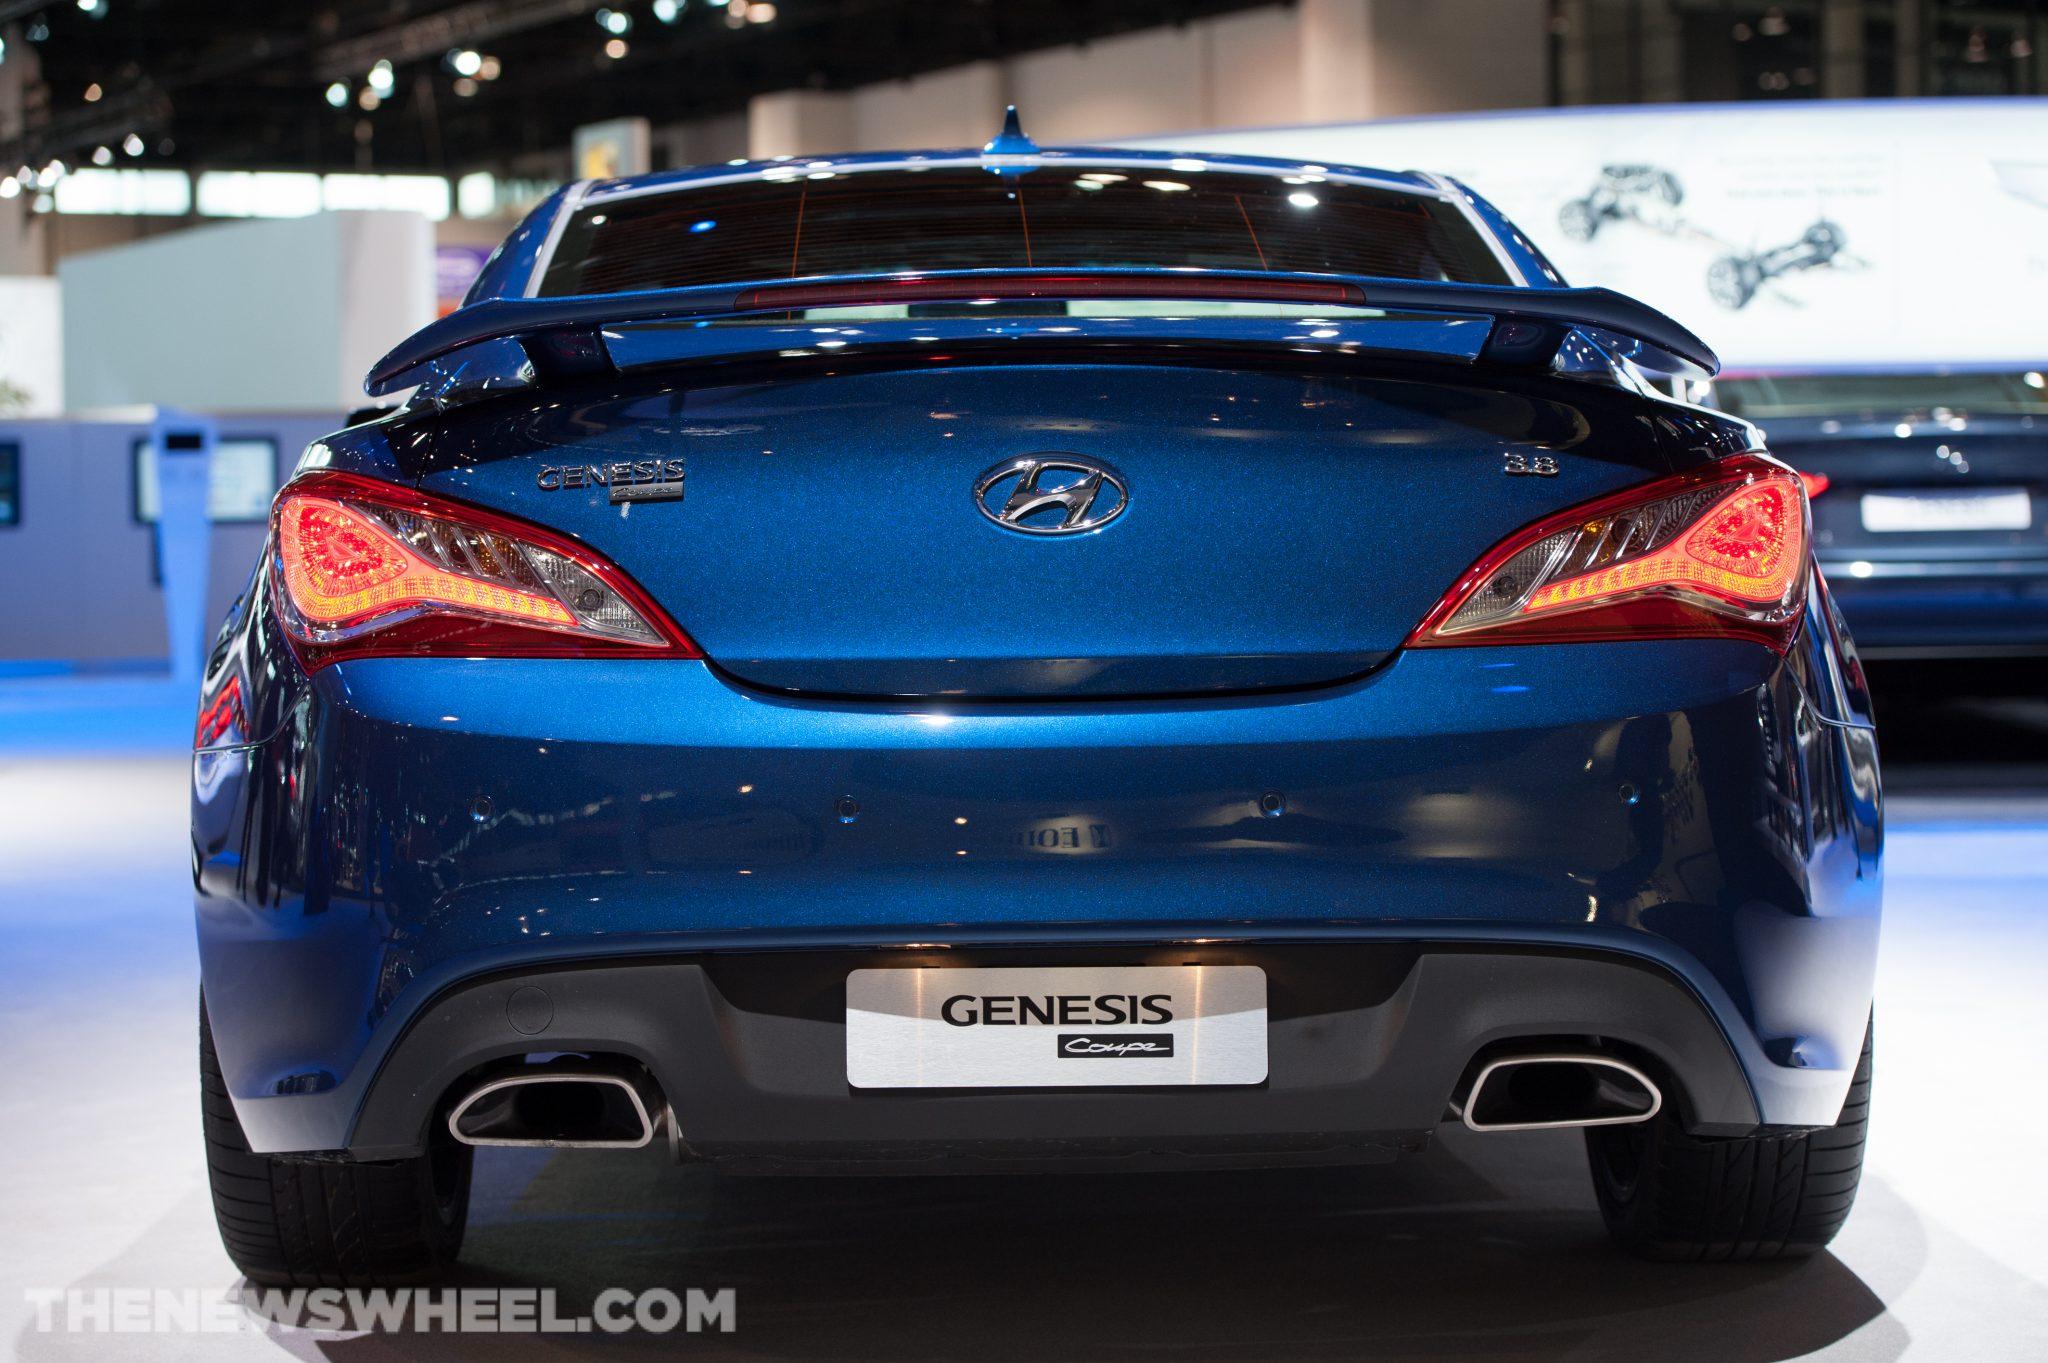 2014 Hyundai Genesis Coupe 2.0 T >> 2014 Hyundai Genesis Coupe Overview The News Wheel